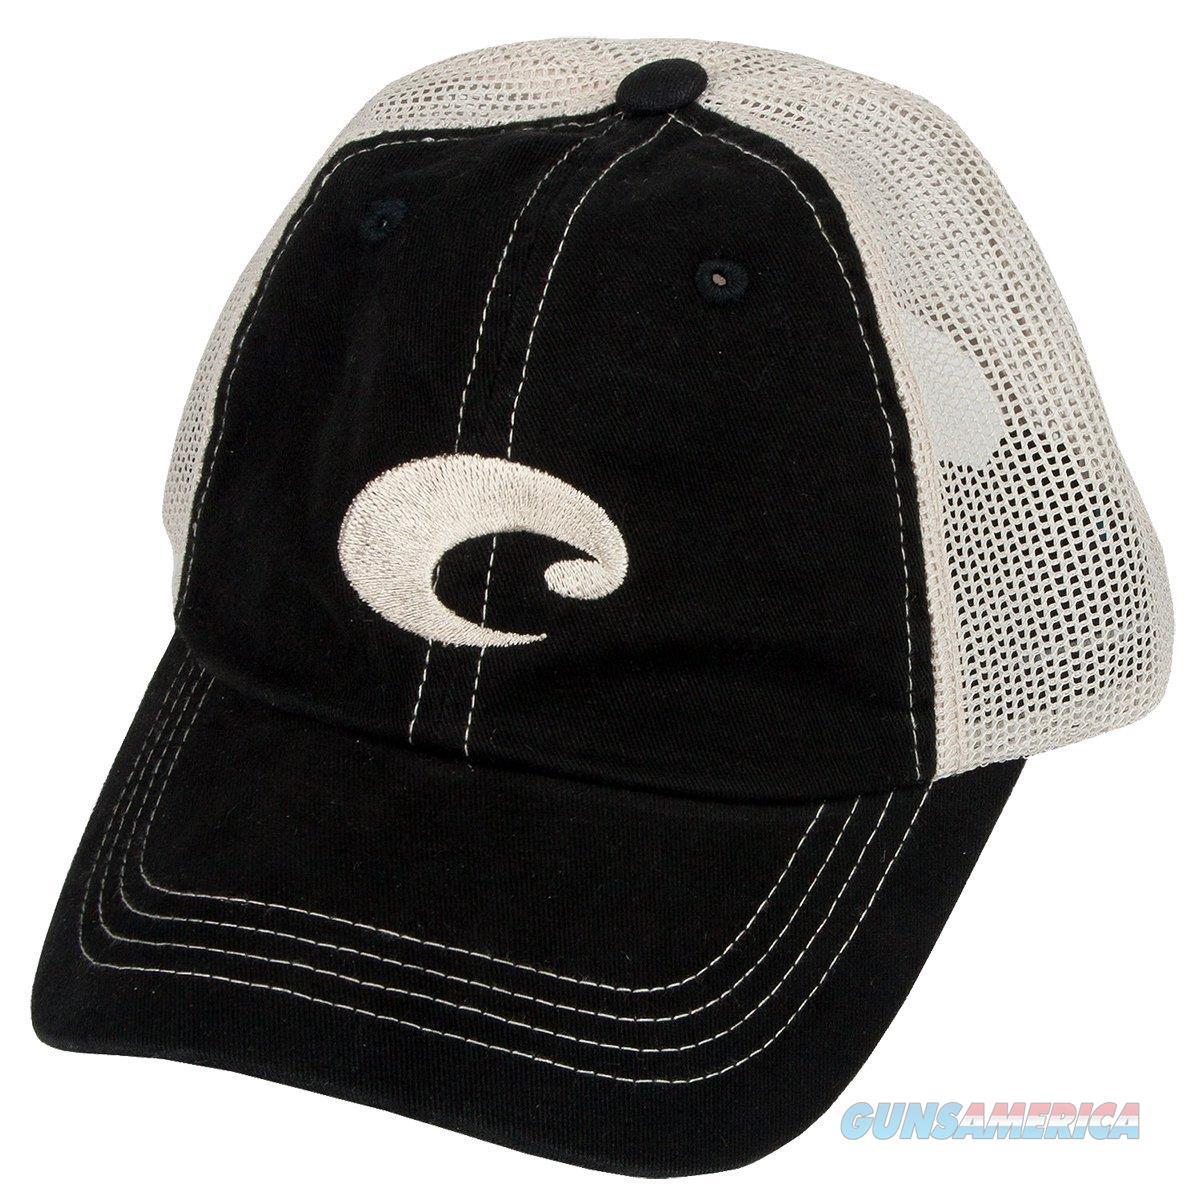 Costa Del Mar Mesh Hat Black Stone  Non-Guns > Hunting Clothing and Equipment > Clothing > Hats